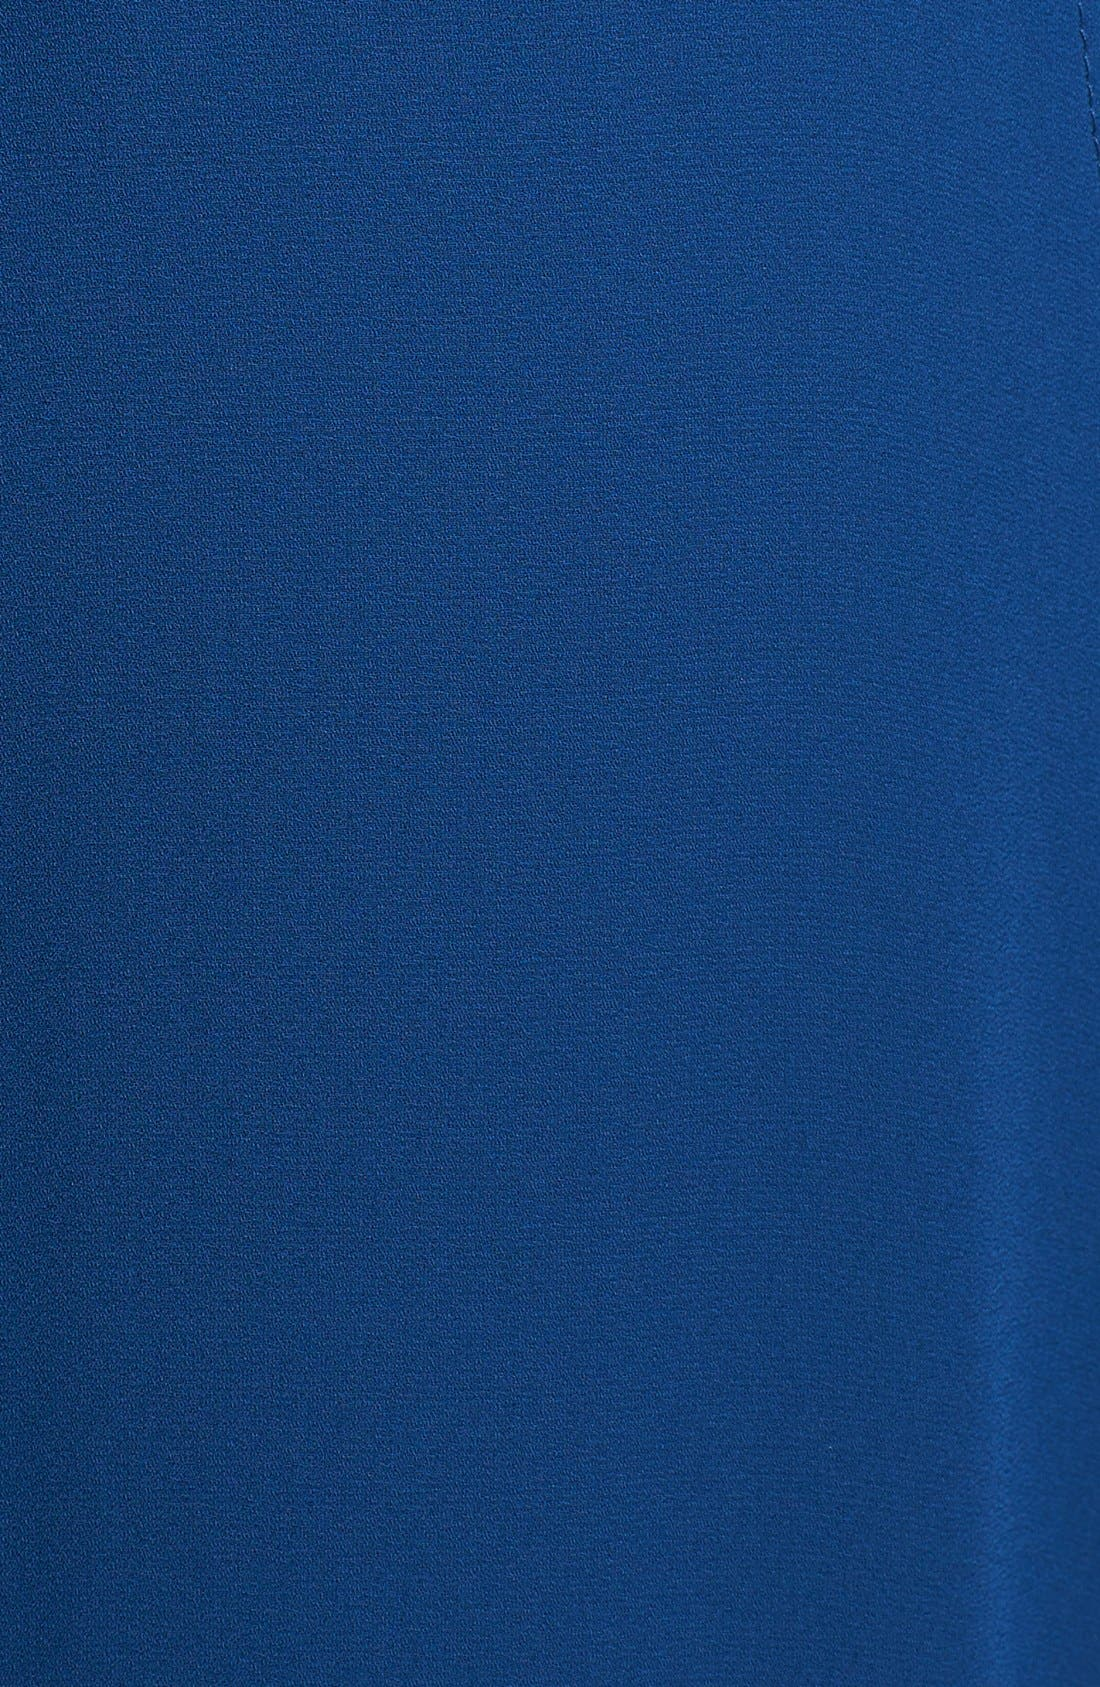 Alternate Image 3  - BCBGMAXAZRIA 'Mara' Halter Gown